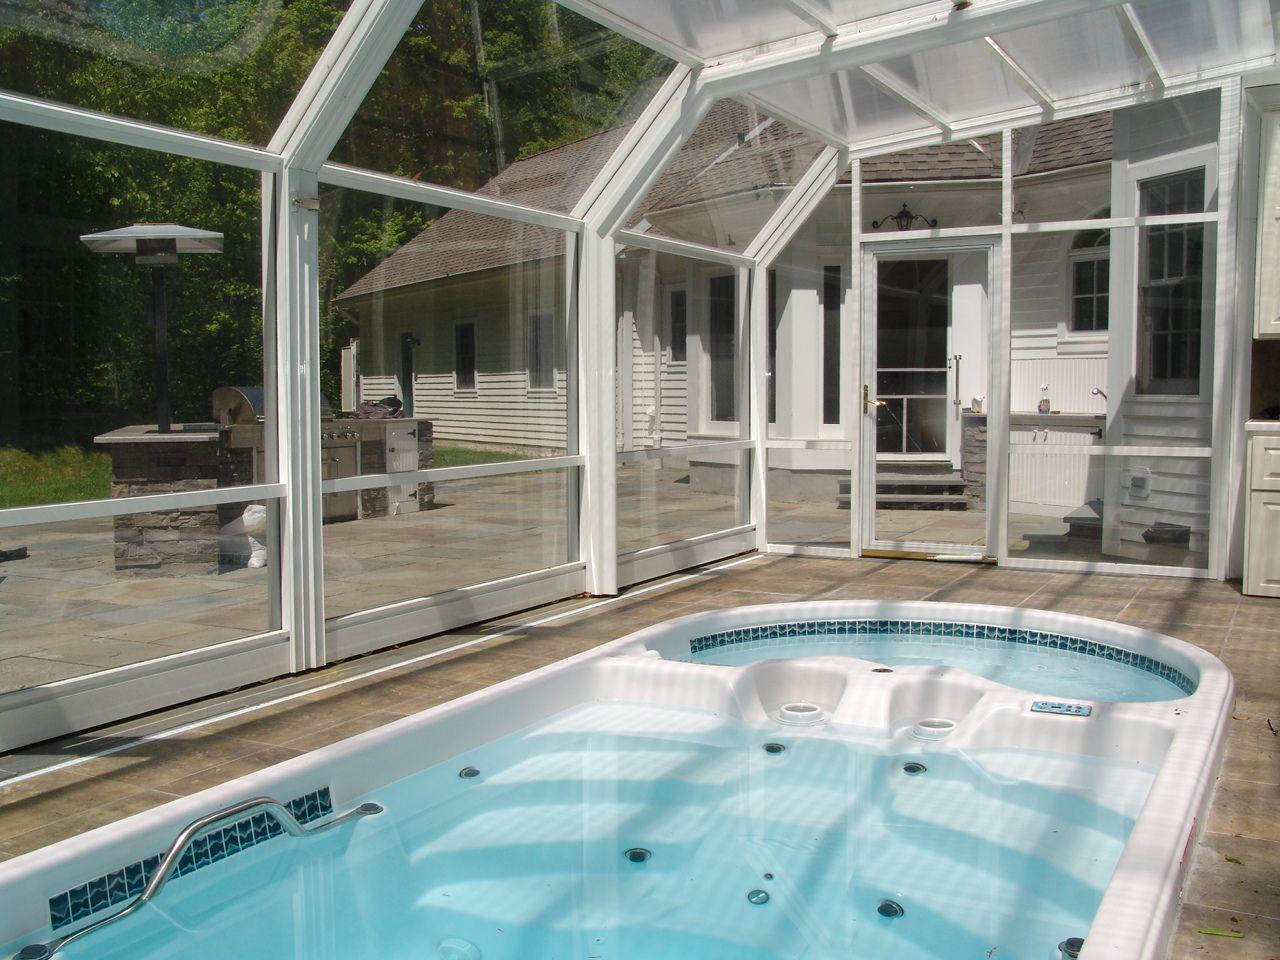 Year Round Indoor Outdoor Hot Tub Rooms Designed By Roll A Cover Hot Tub Room Hot Tub Outdoor Indoor Outdoor Pool